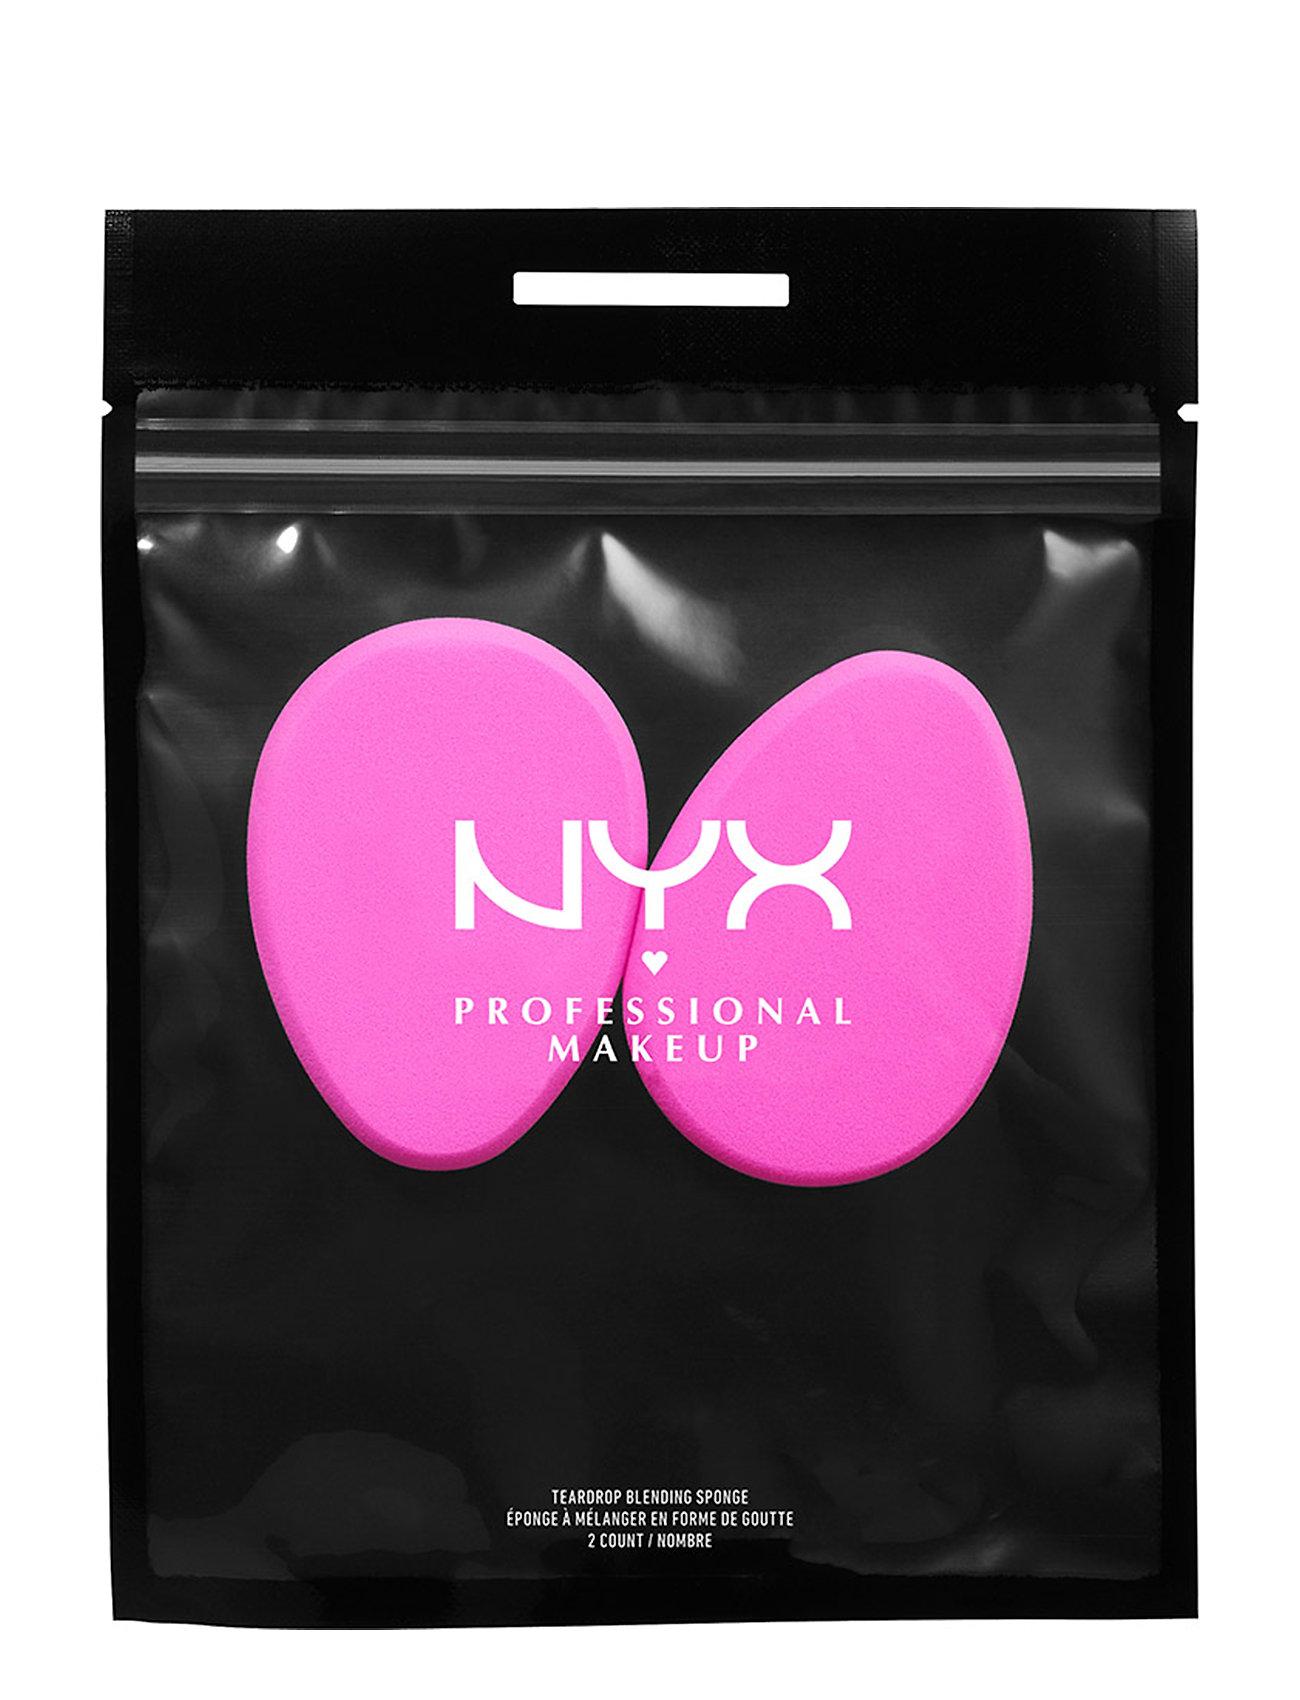 Image of Latex Free Tear-Drop Blending Sponge Beauty WOMEN Makeup Sponges & Applicators Sort NYX PROFESSIONAL MAKEUP (3439404069)